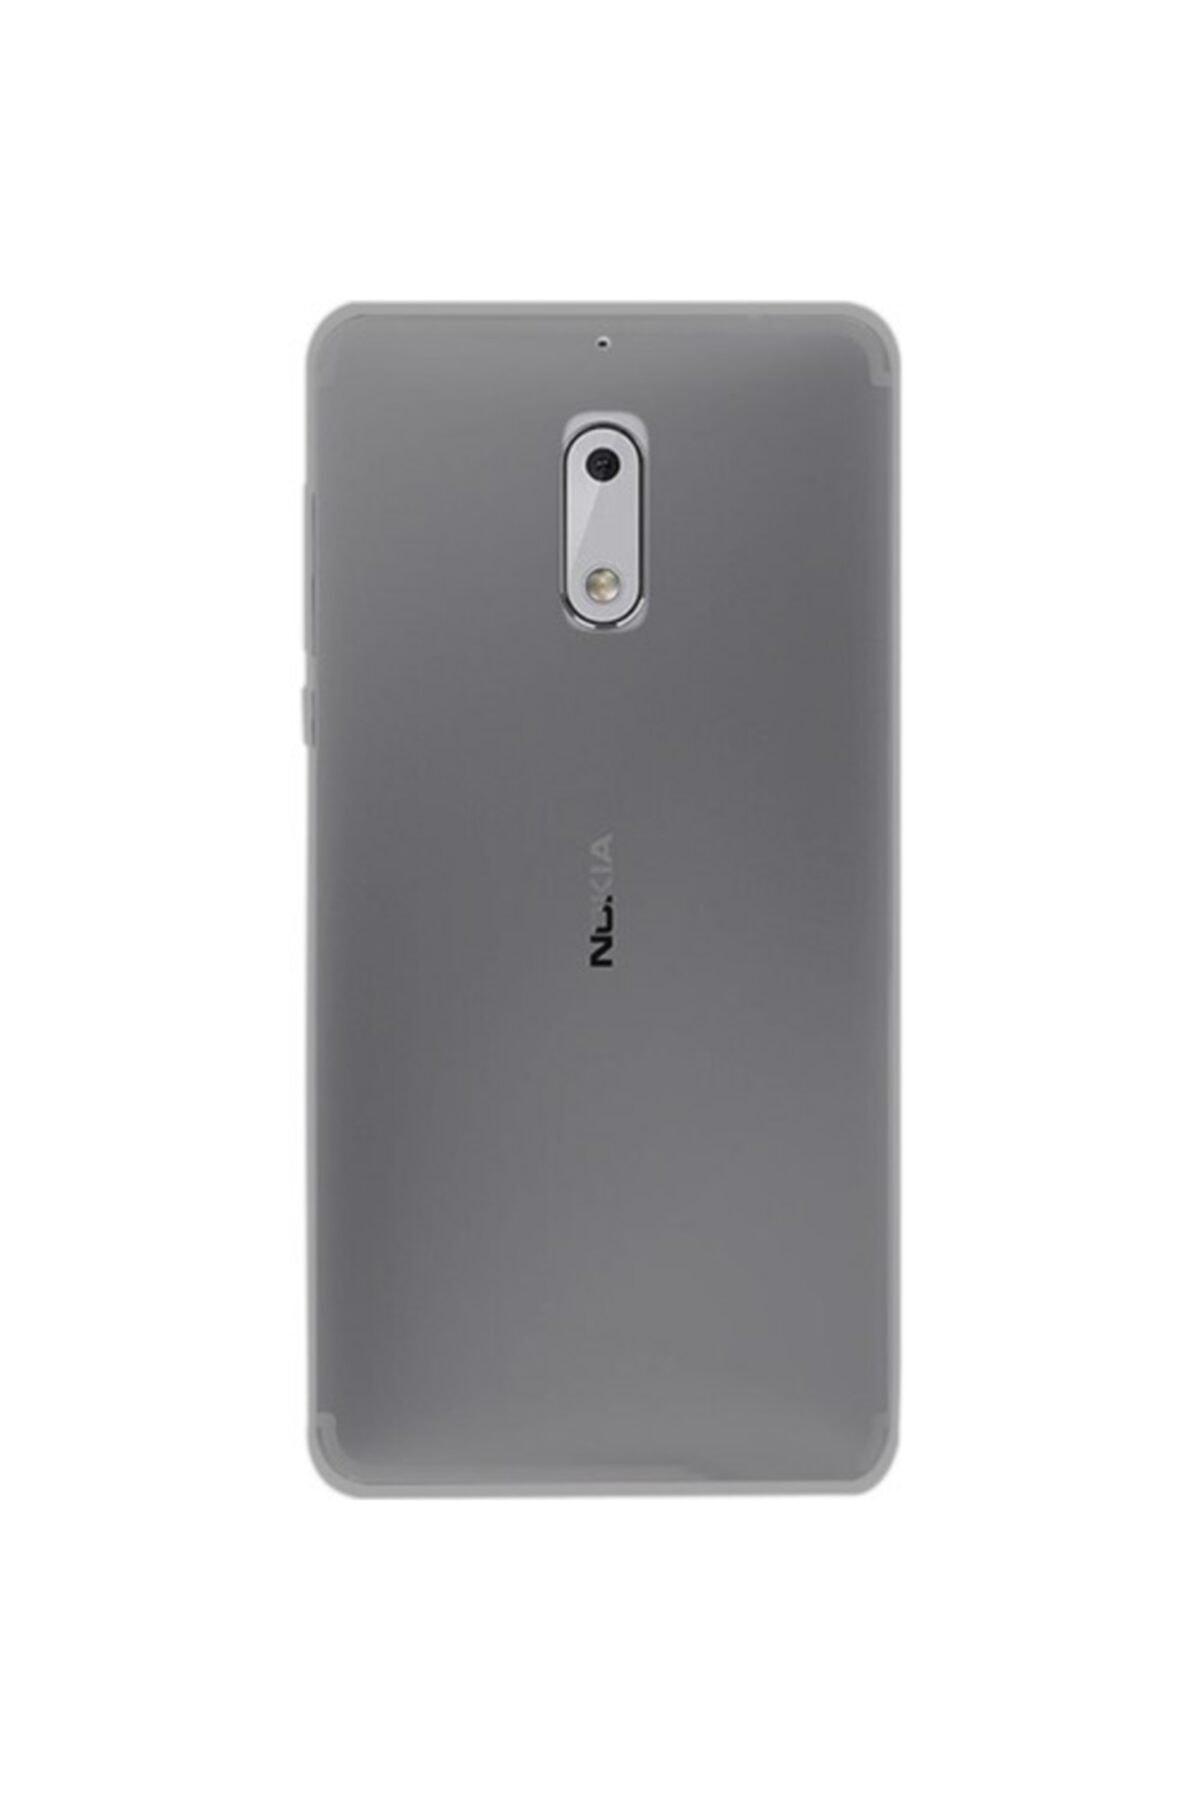 Nokia 3 Kılıf Soft Silikon Şeffaf-siyah Arka Kapak 1